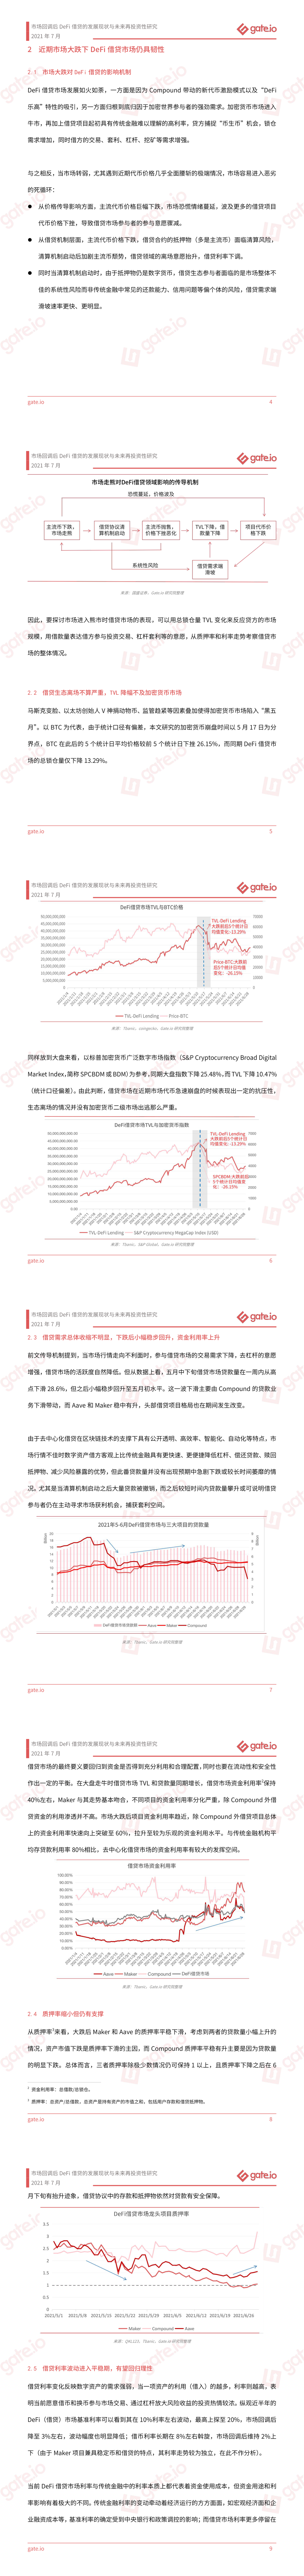 Gate.io研究院:市场回调后DeFi借贷的发展现状与未来再投资性研究